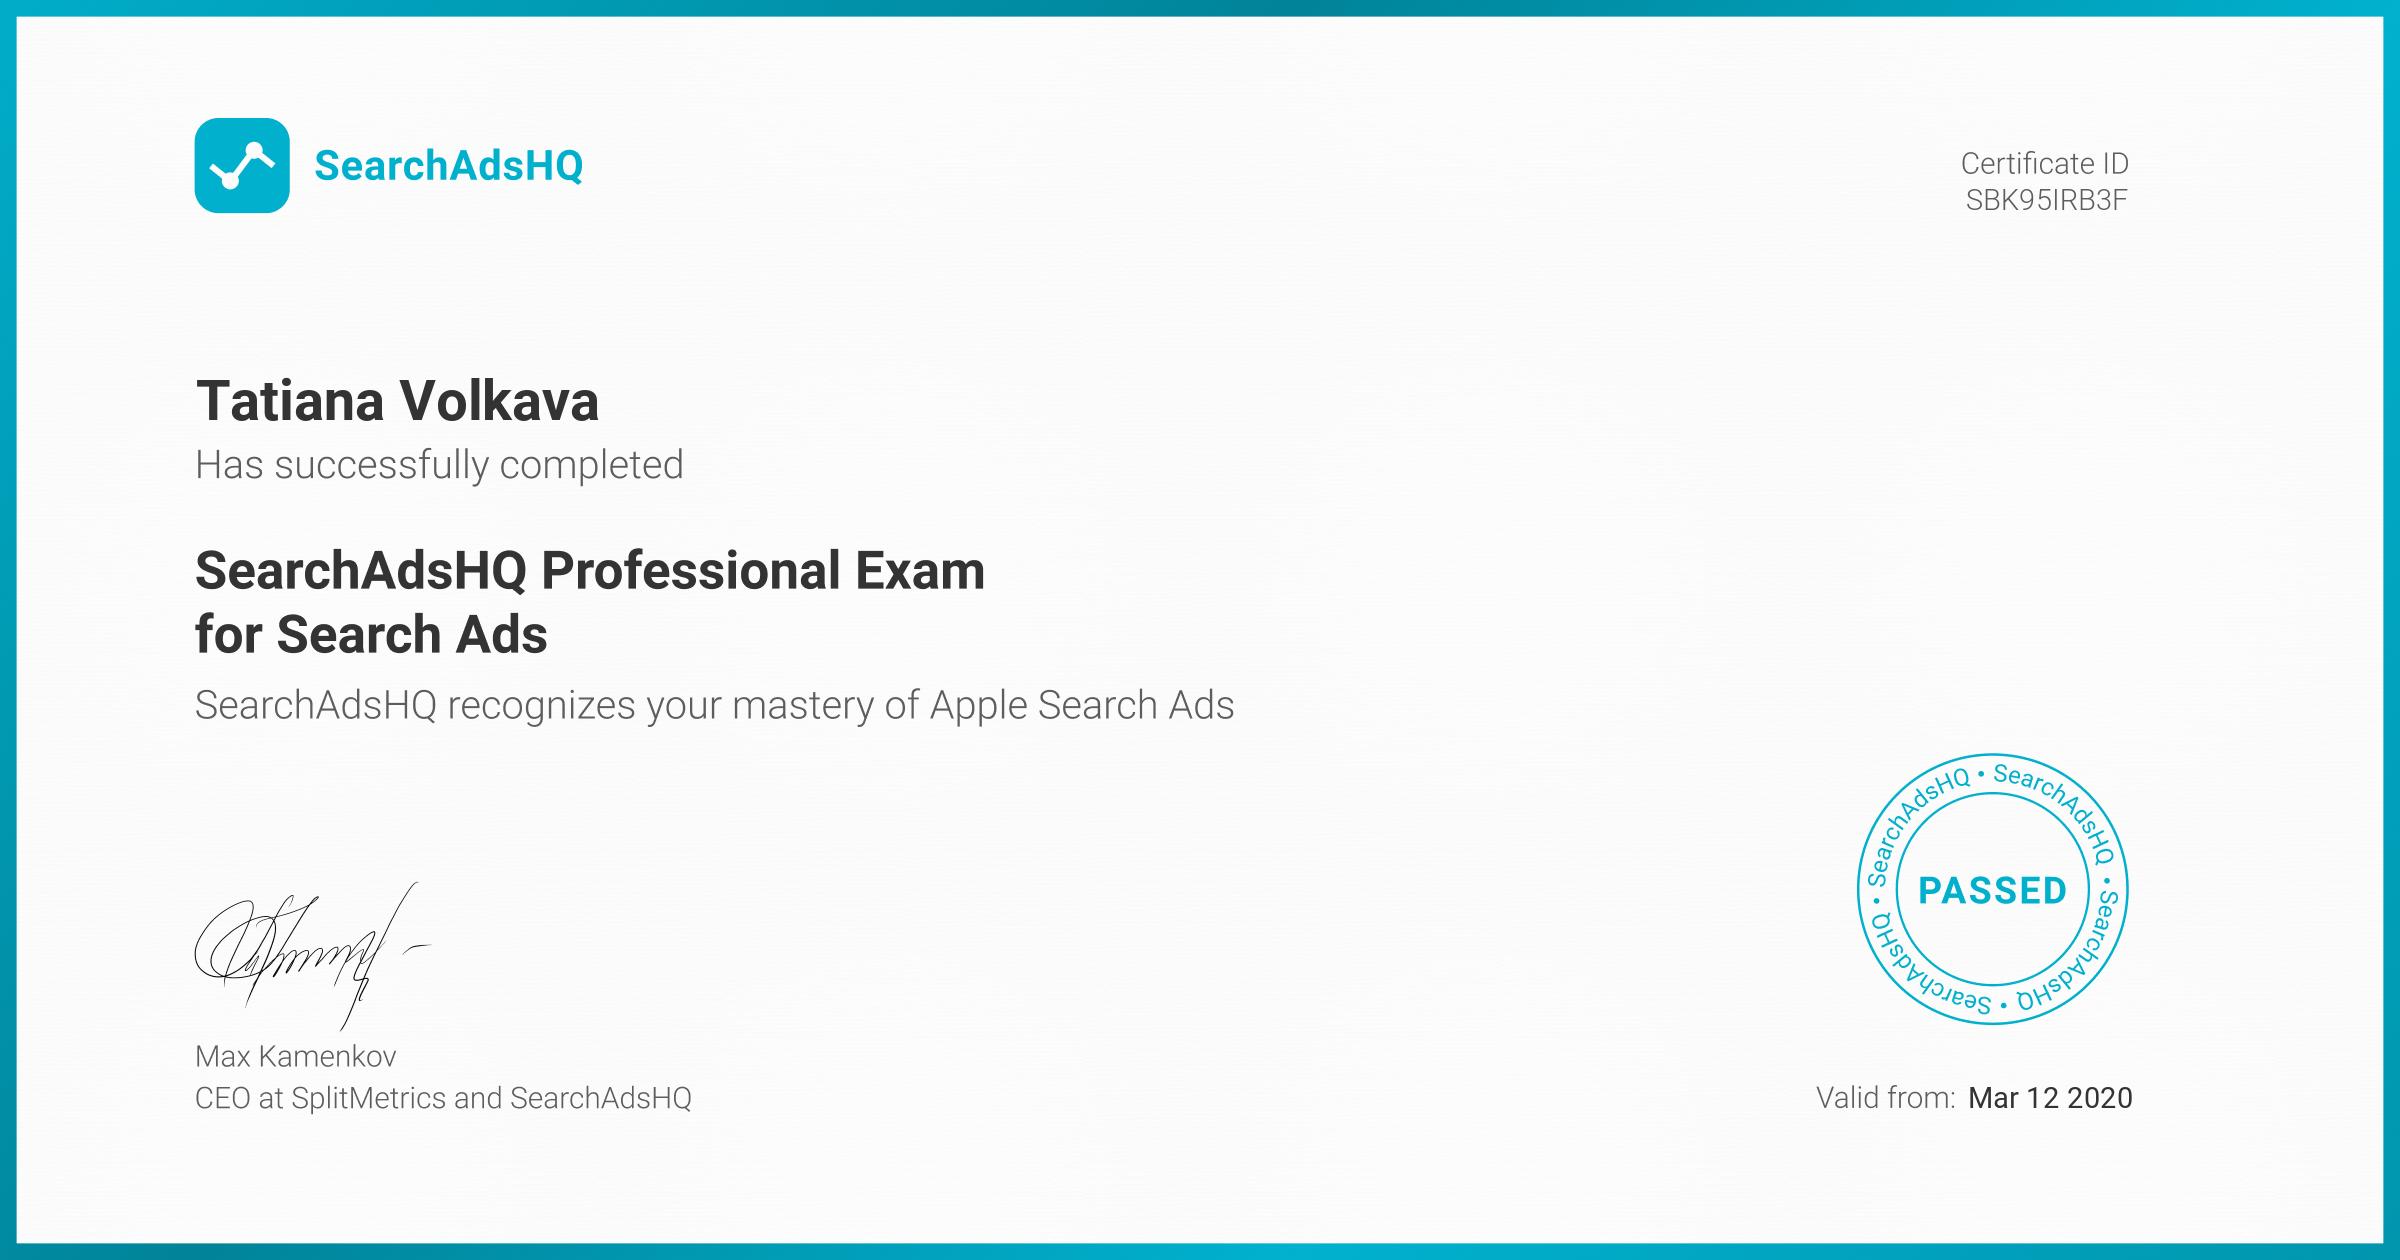 Certificate for Tatiana Volkava | SearchAdsHQ Professional Exam for Search Ads